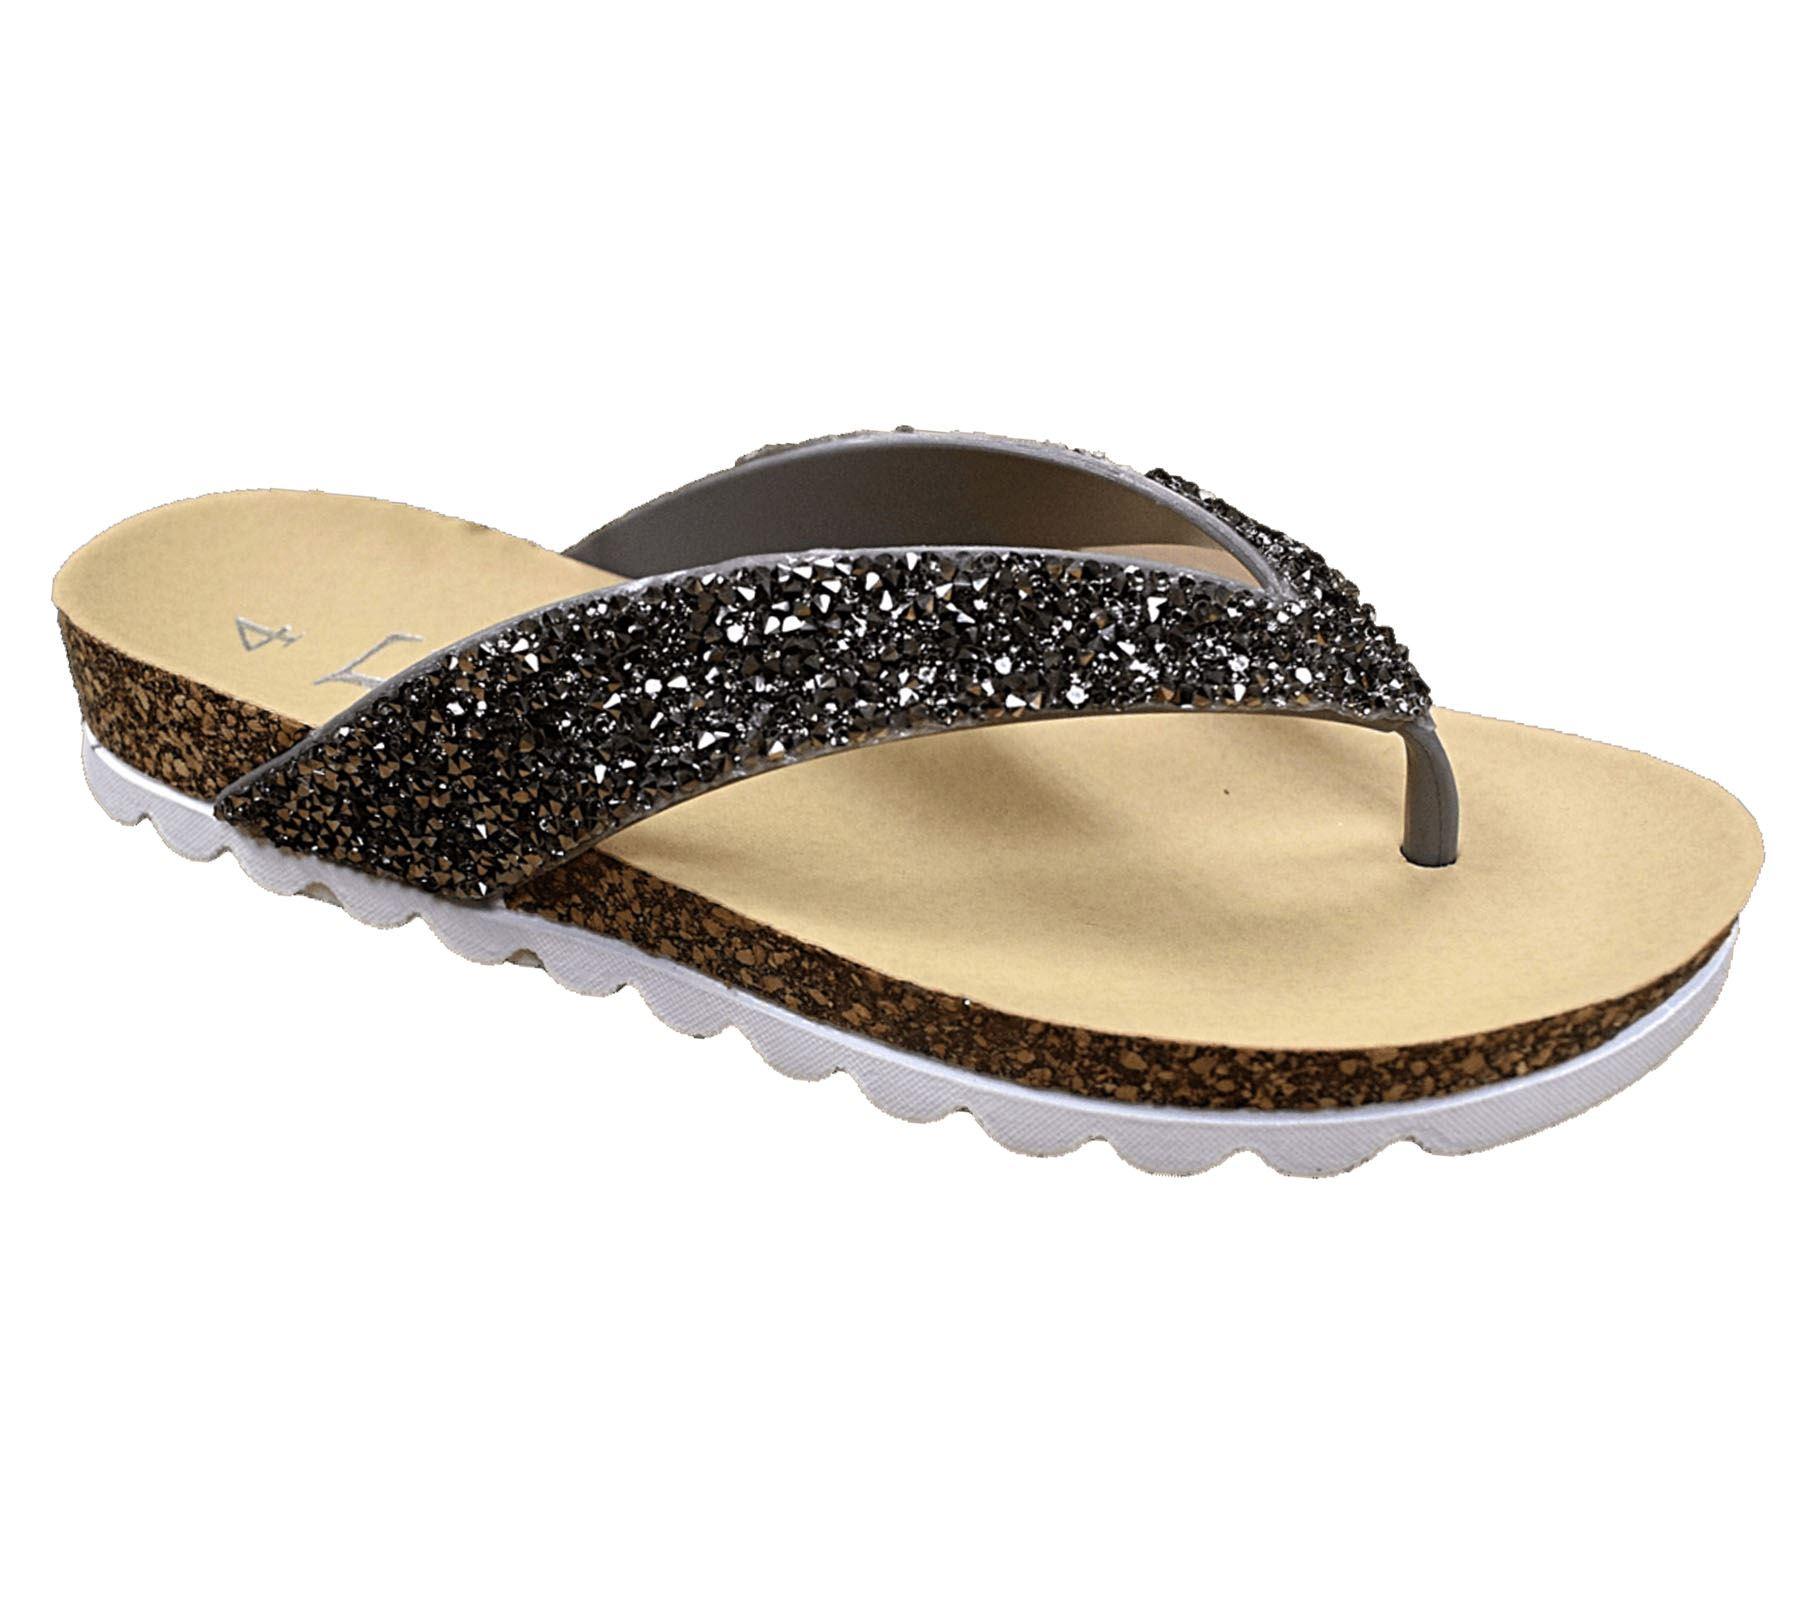 Womens Casual Toe Post Sparkly Sandals Ladies Summer Flip Flops Sliders Mules